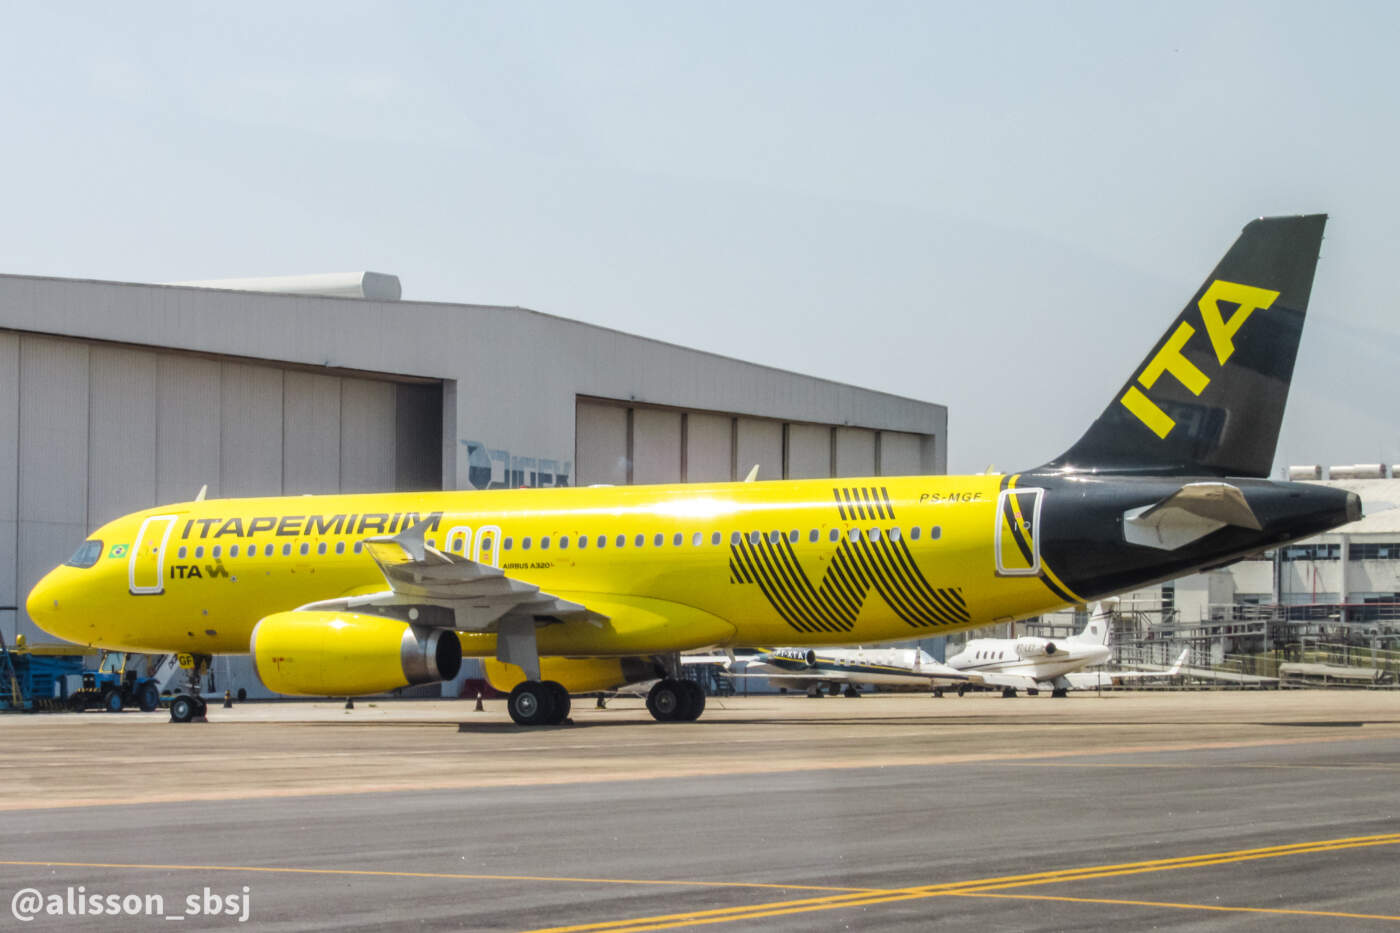 Itapemirim Airbus A320 PS-MGF